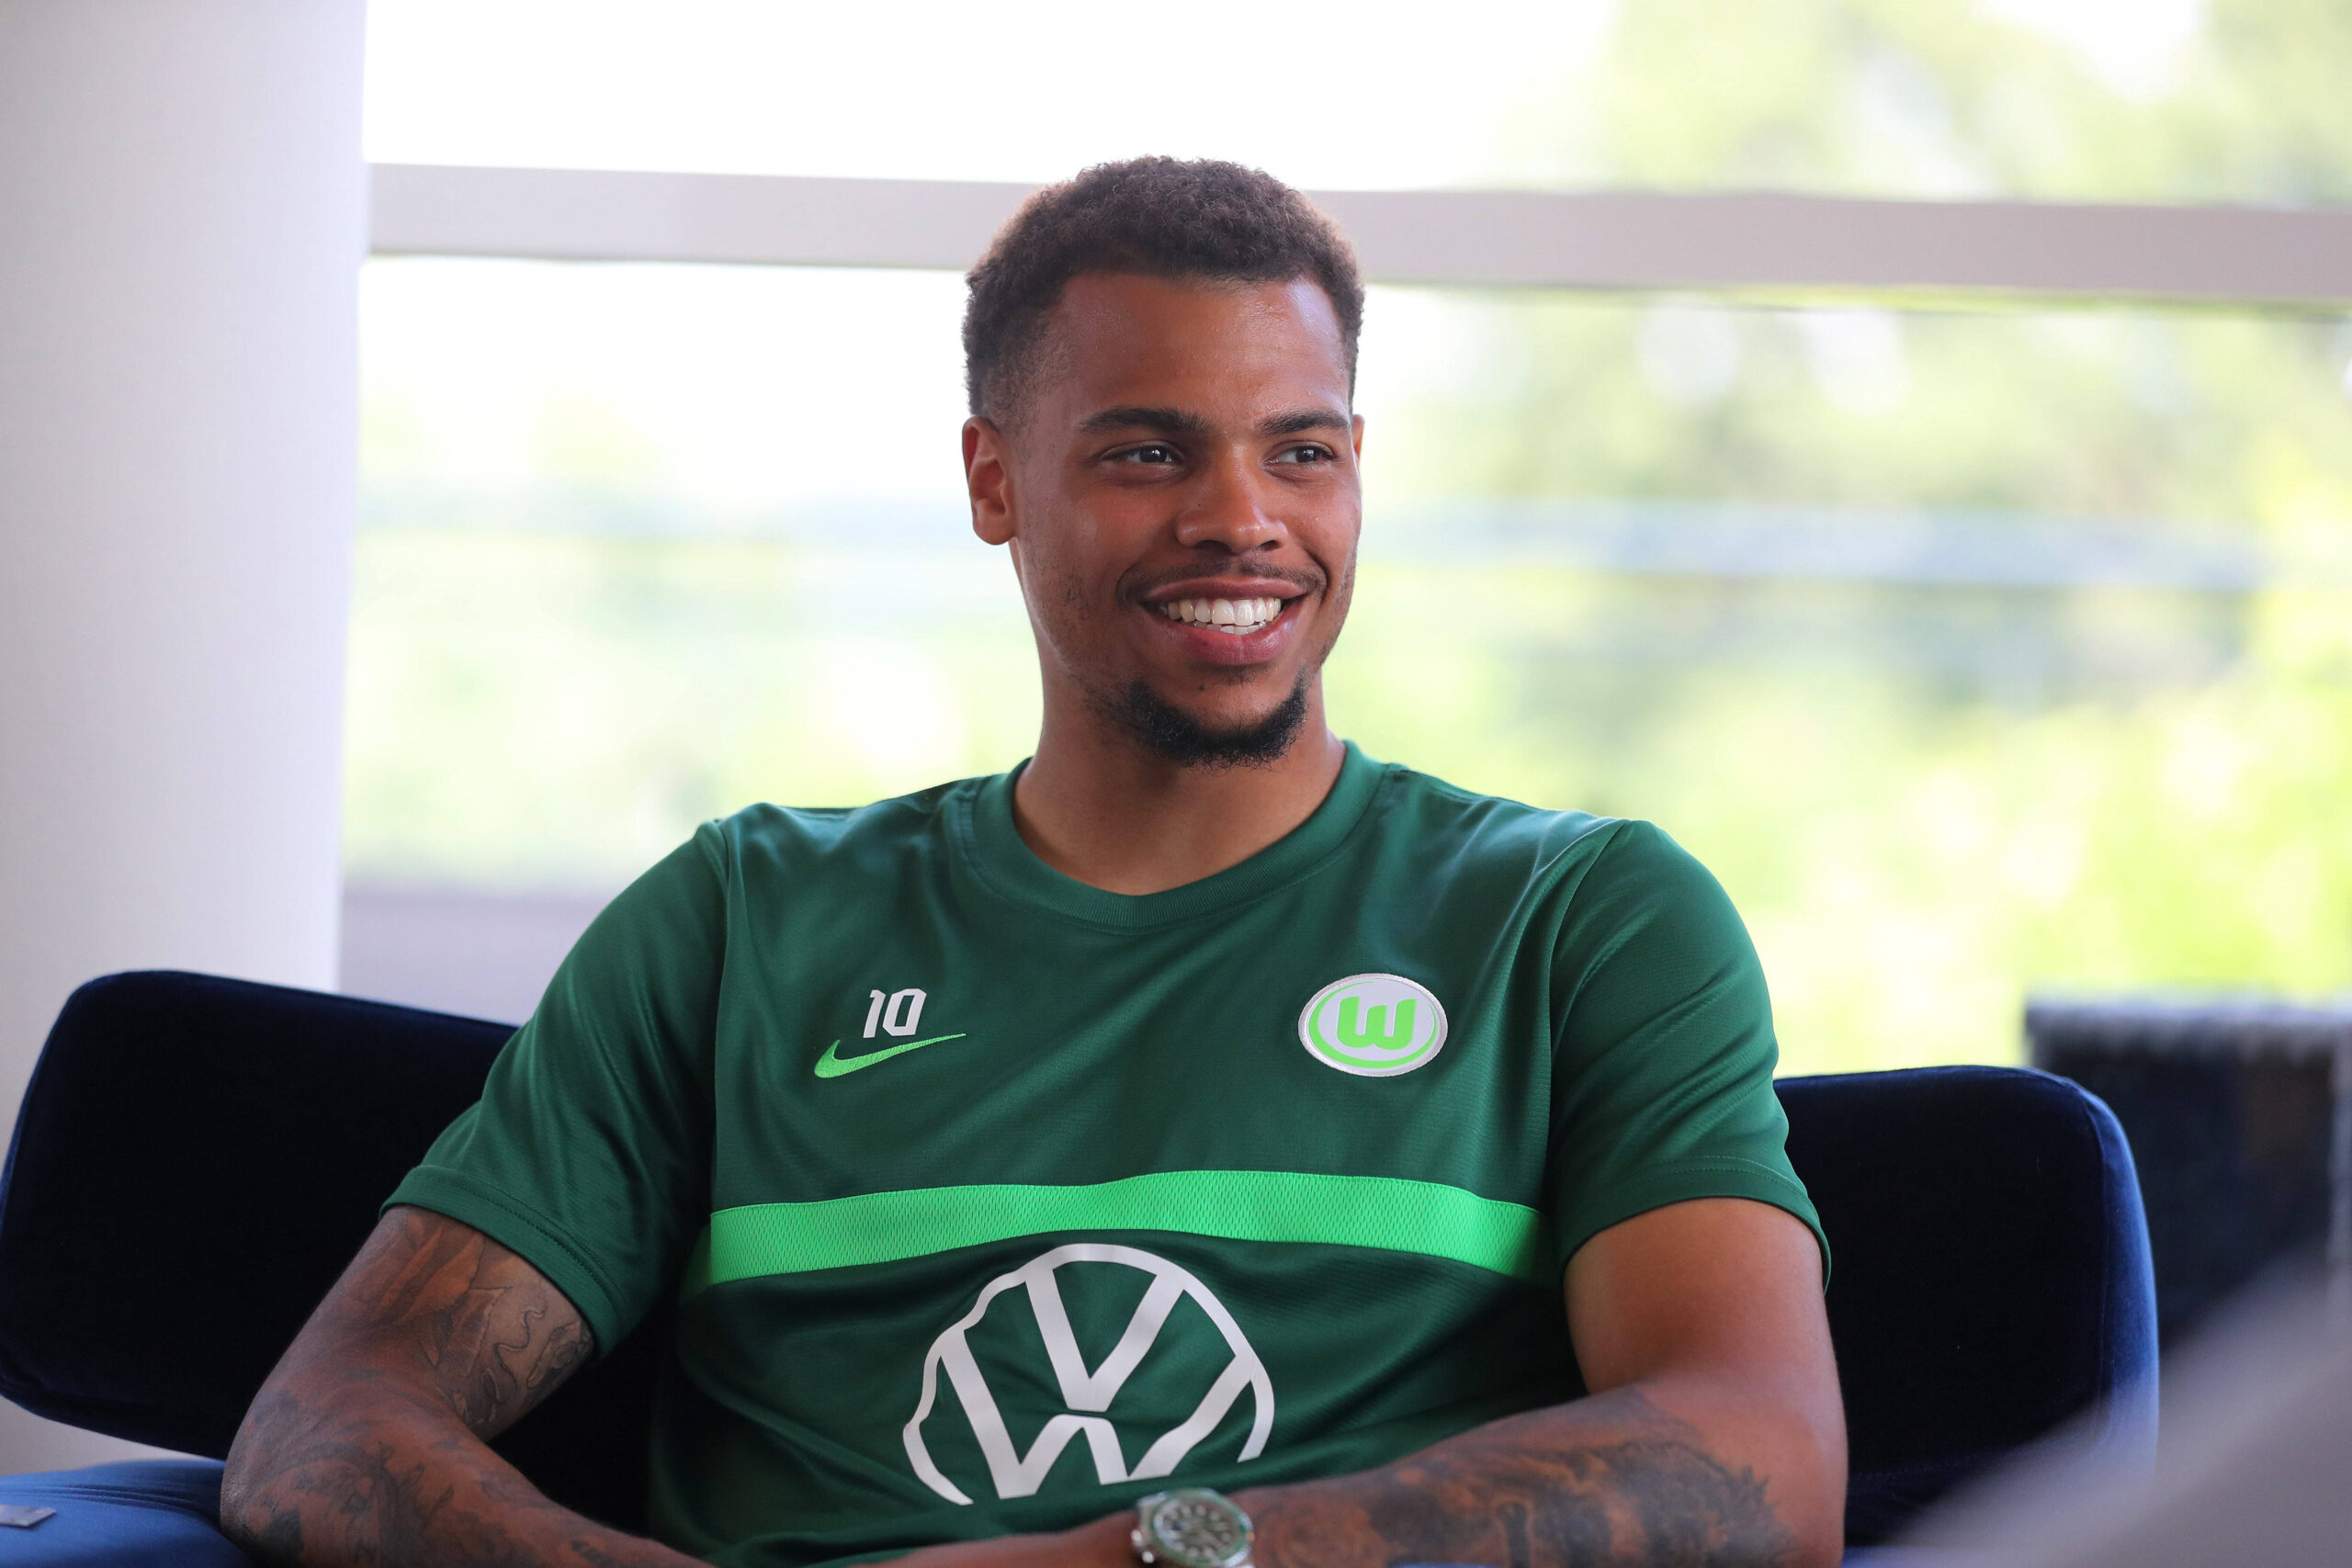 Lukas Nmecha se siente a gusto en su nueva etapa como Wolfsburg. Foto: Imago.